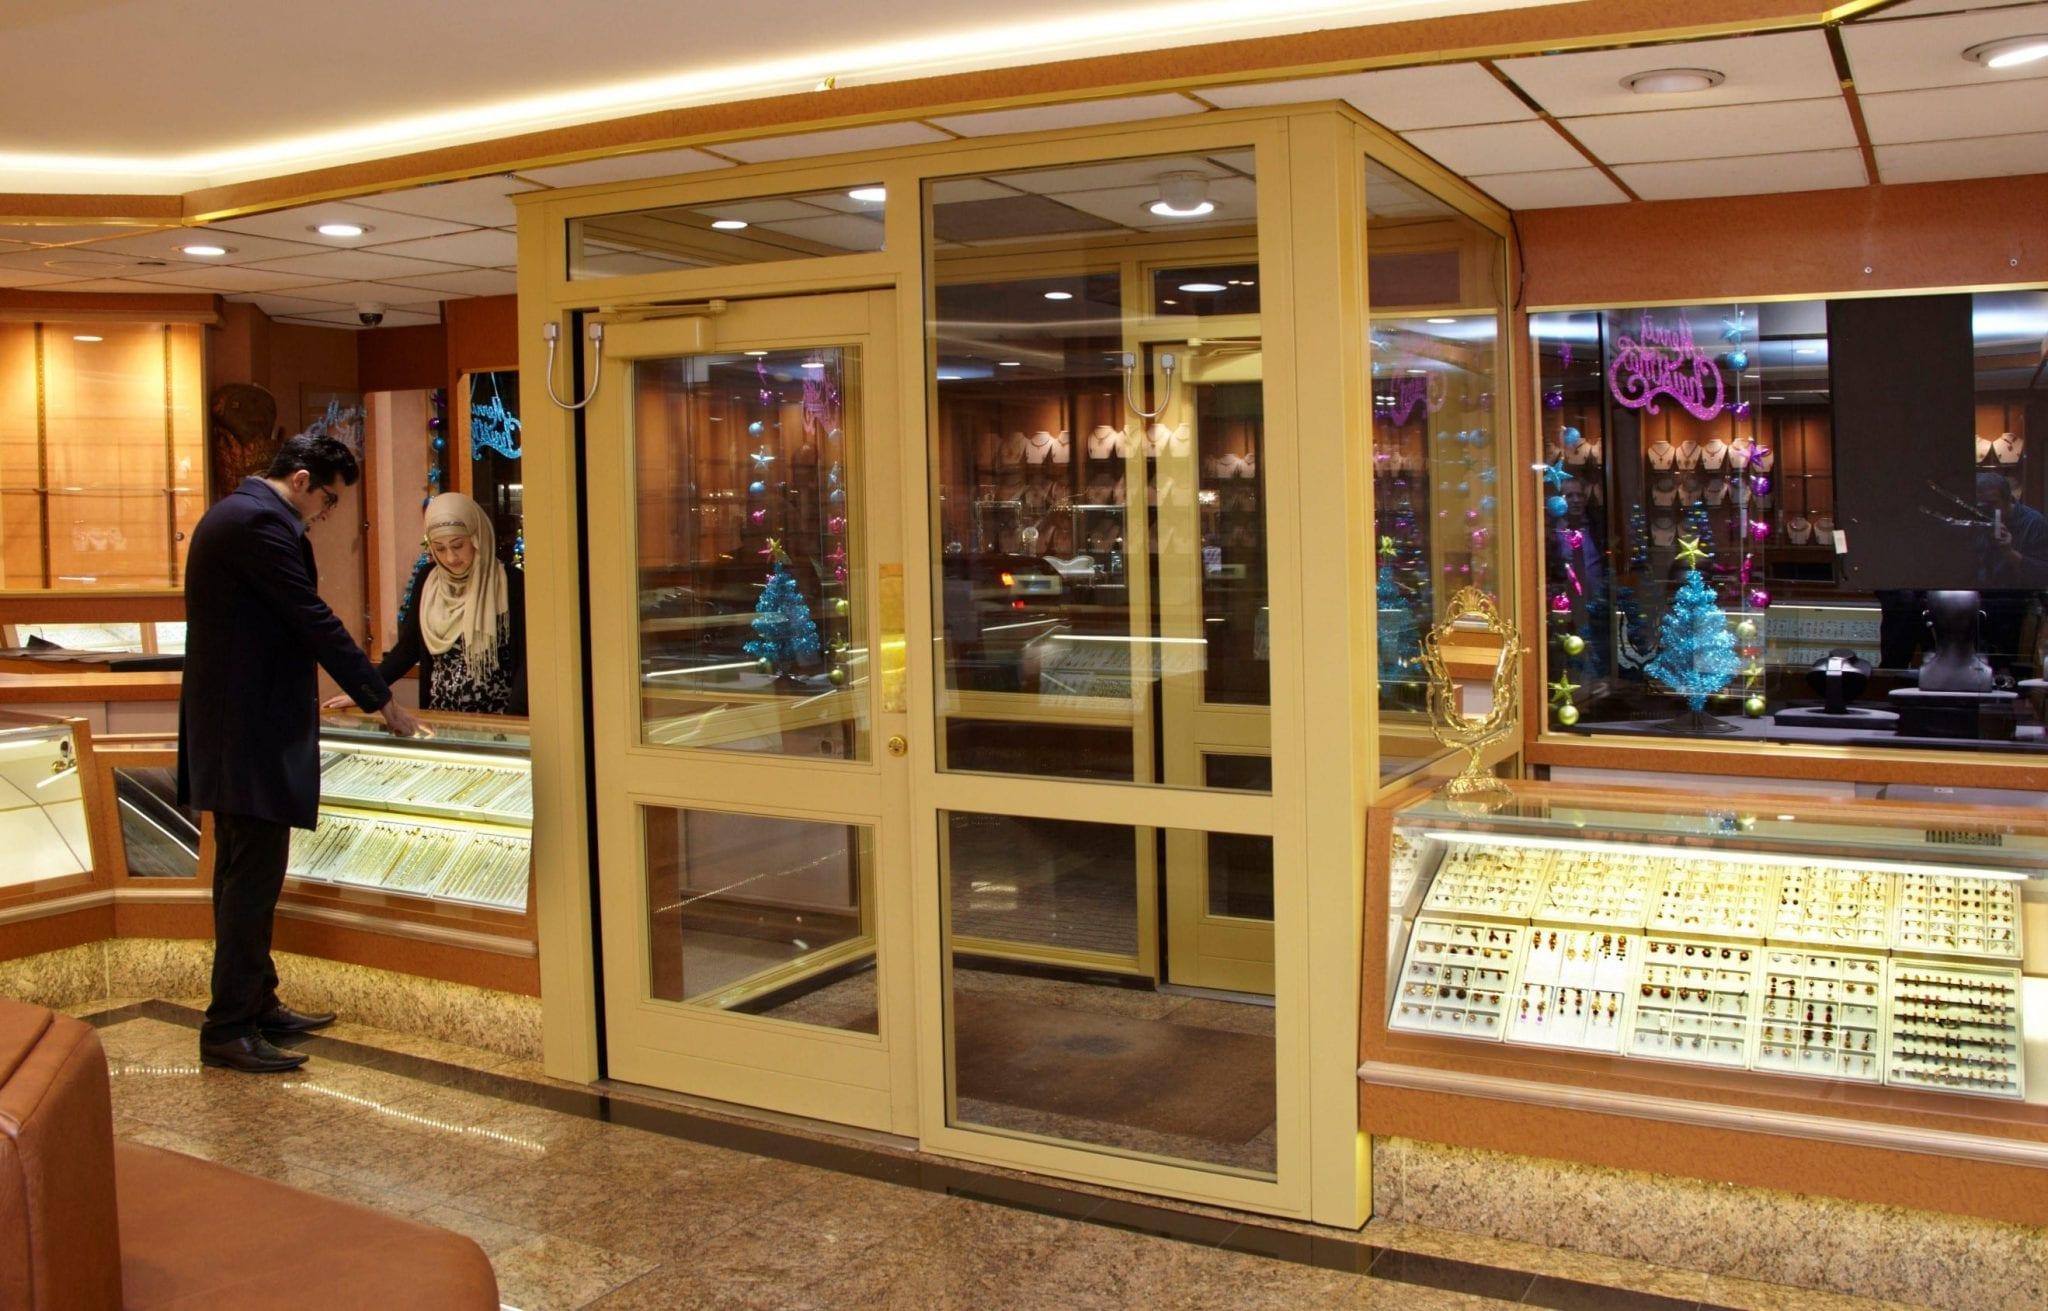 Warrior Fully Glazed Sliding Interlocking Doors from the inside of a jewellery shop